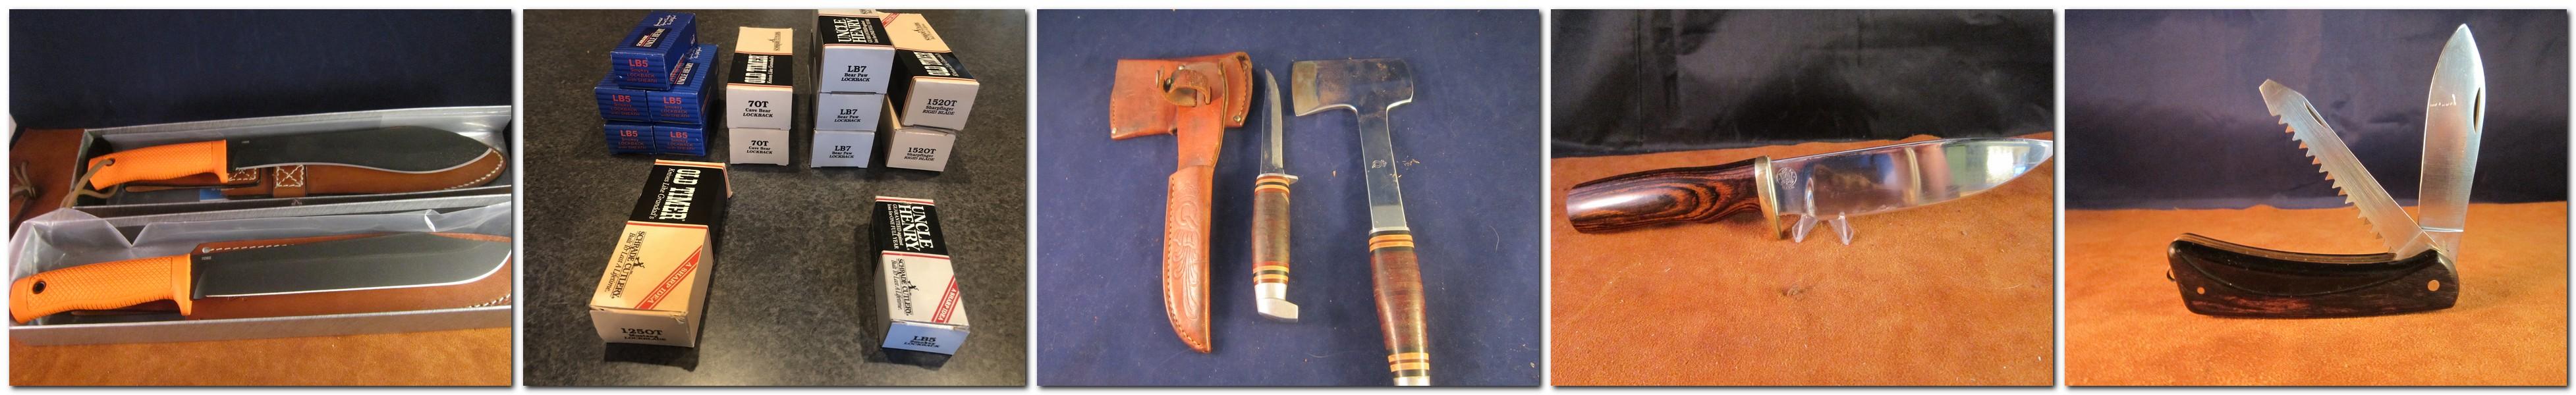 we-buy-knives-new-used.jpg